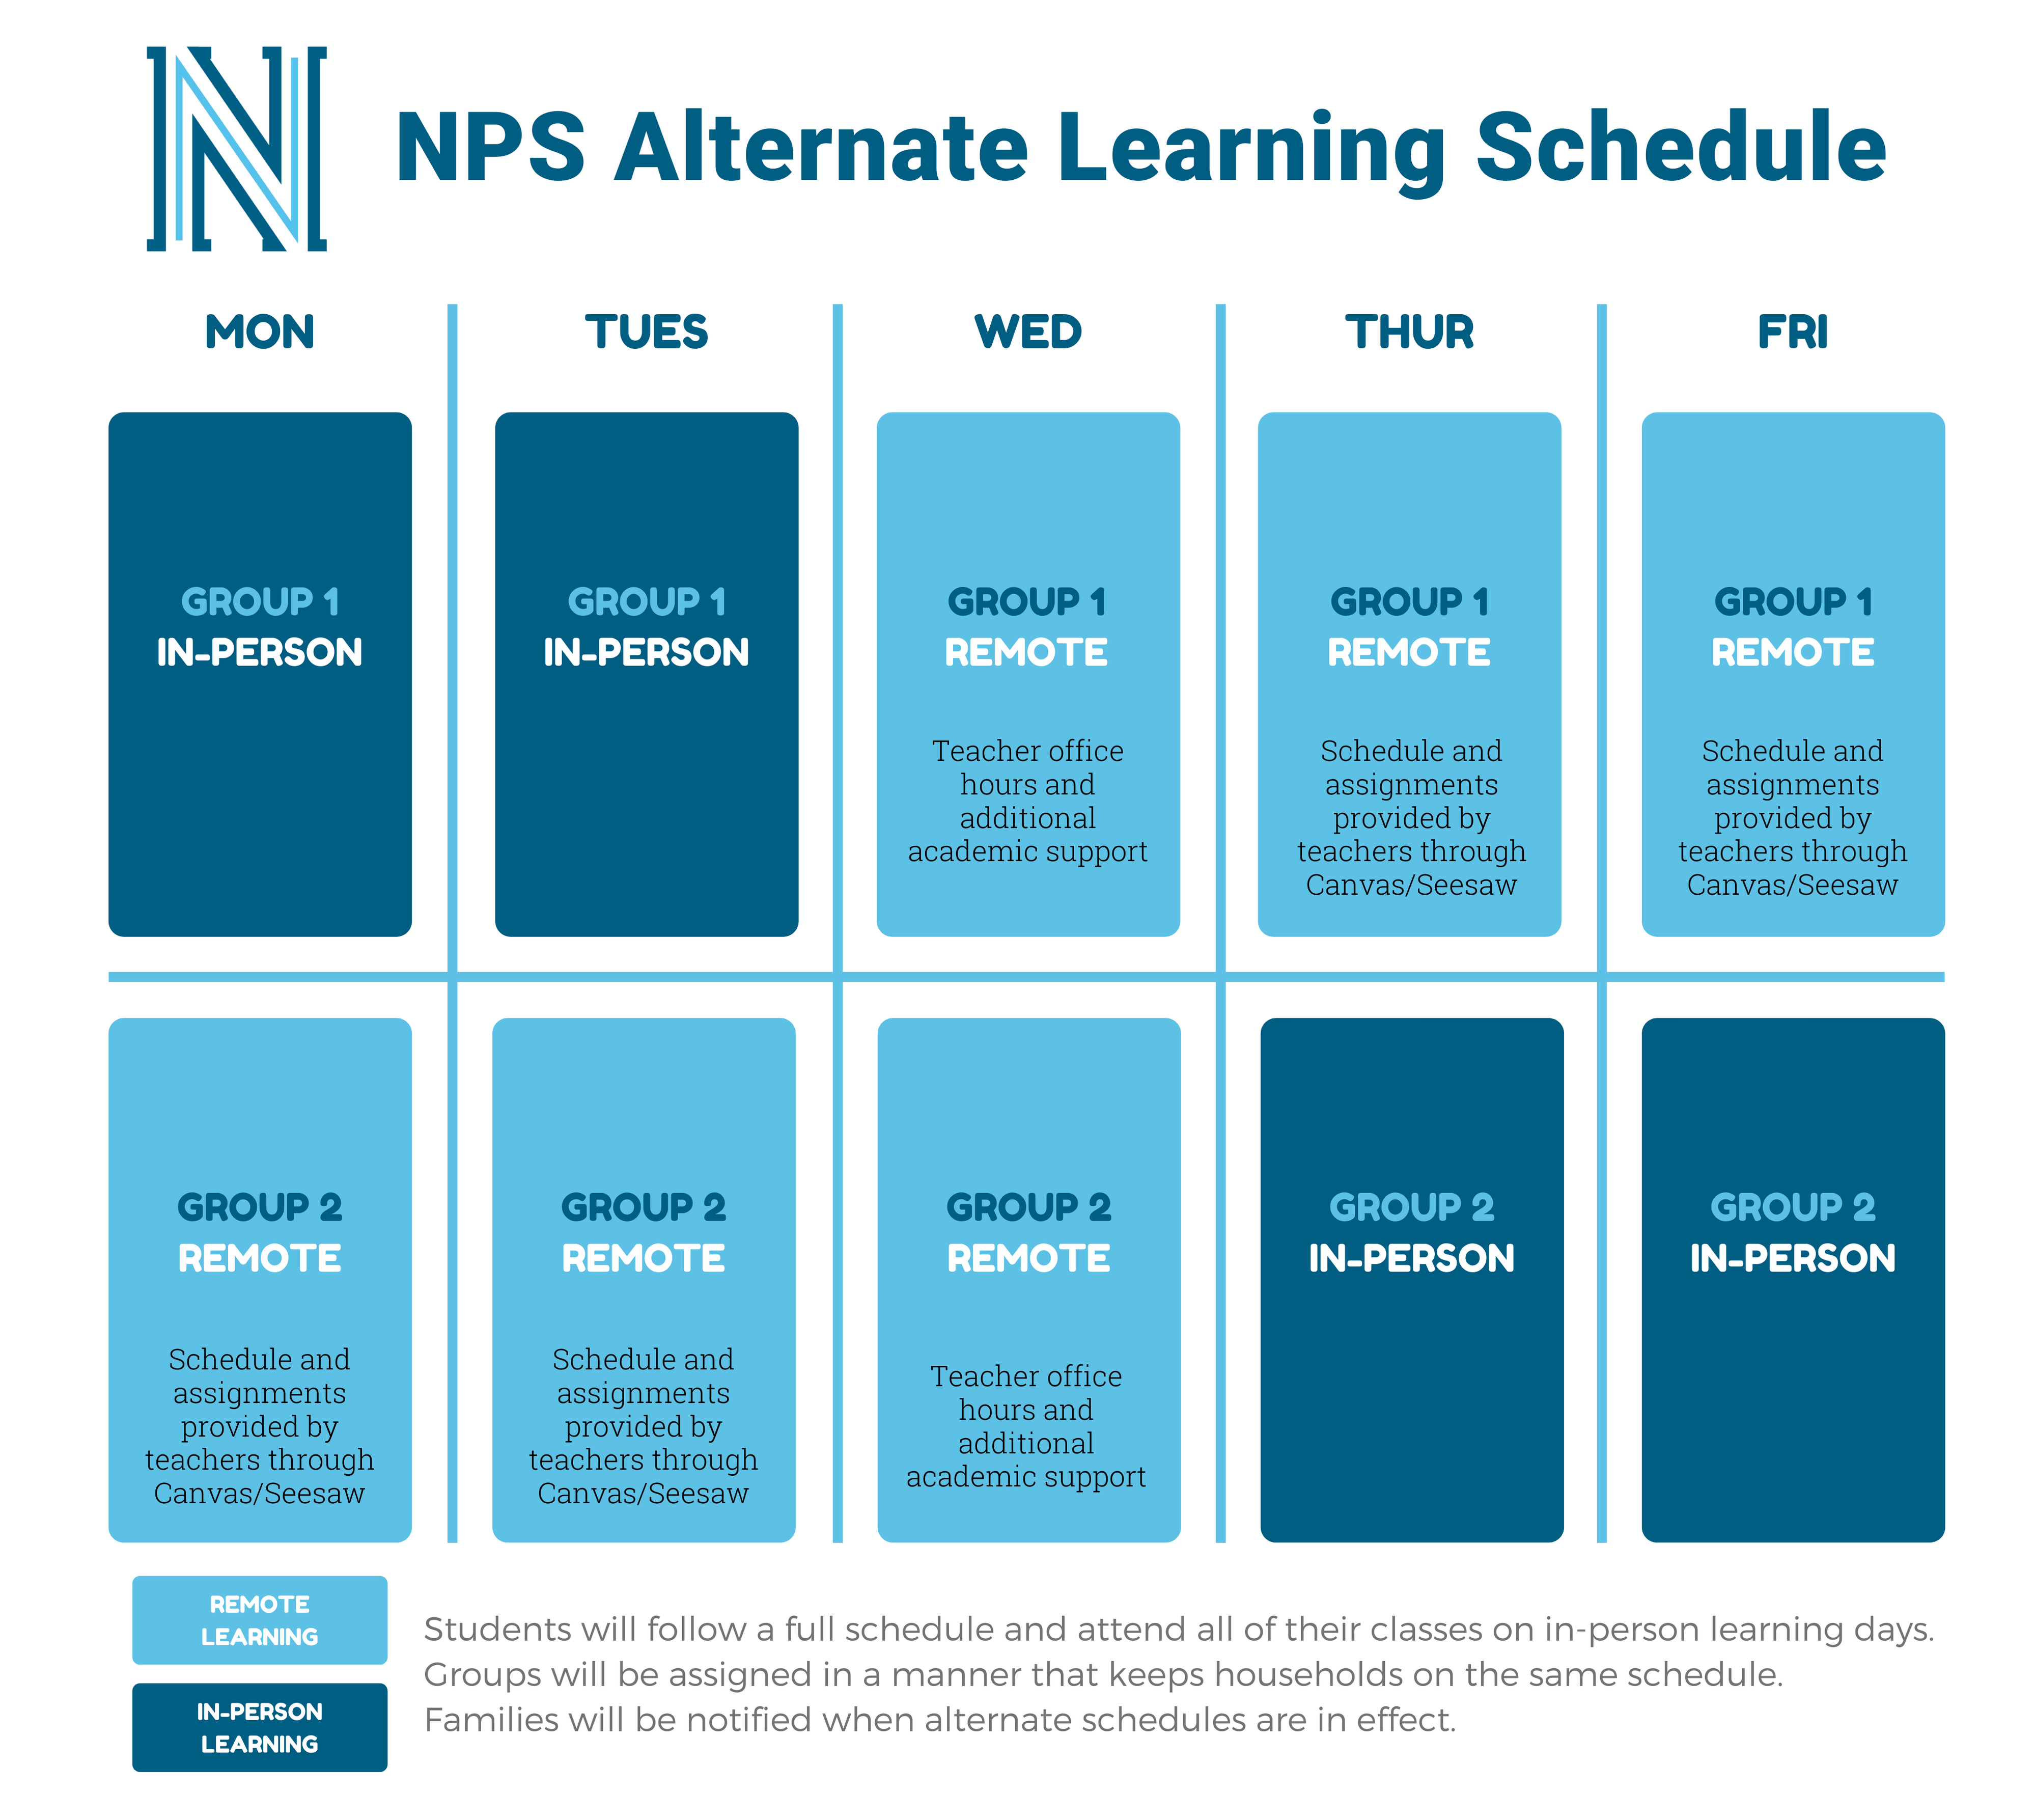 Alternate Learning Schedule